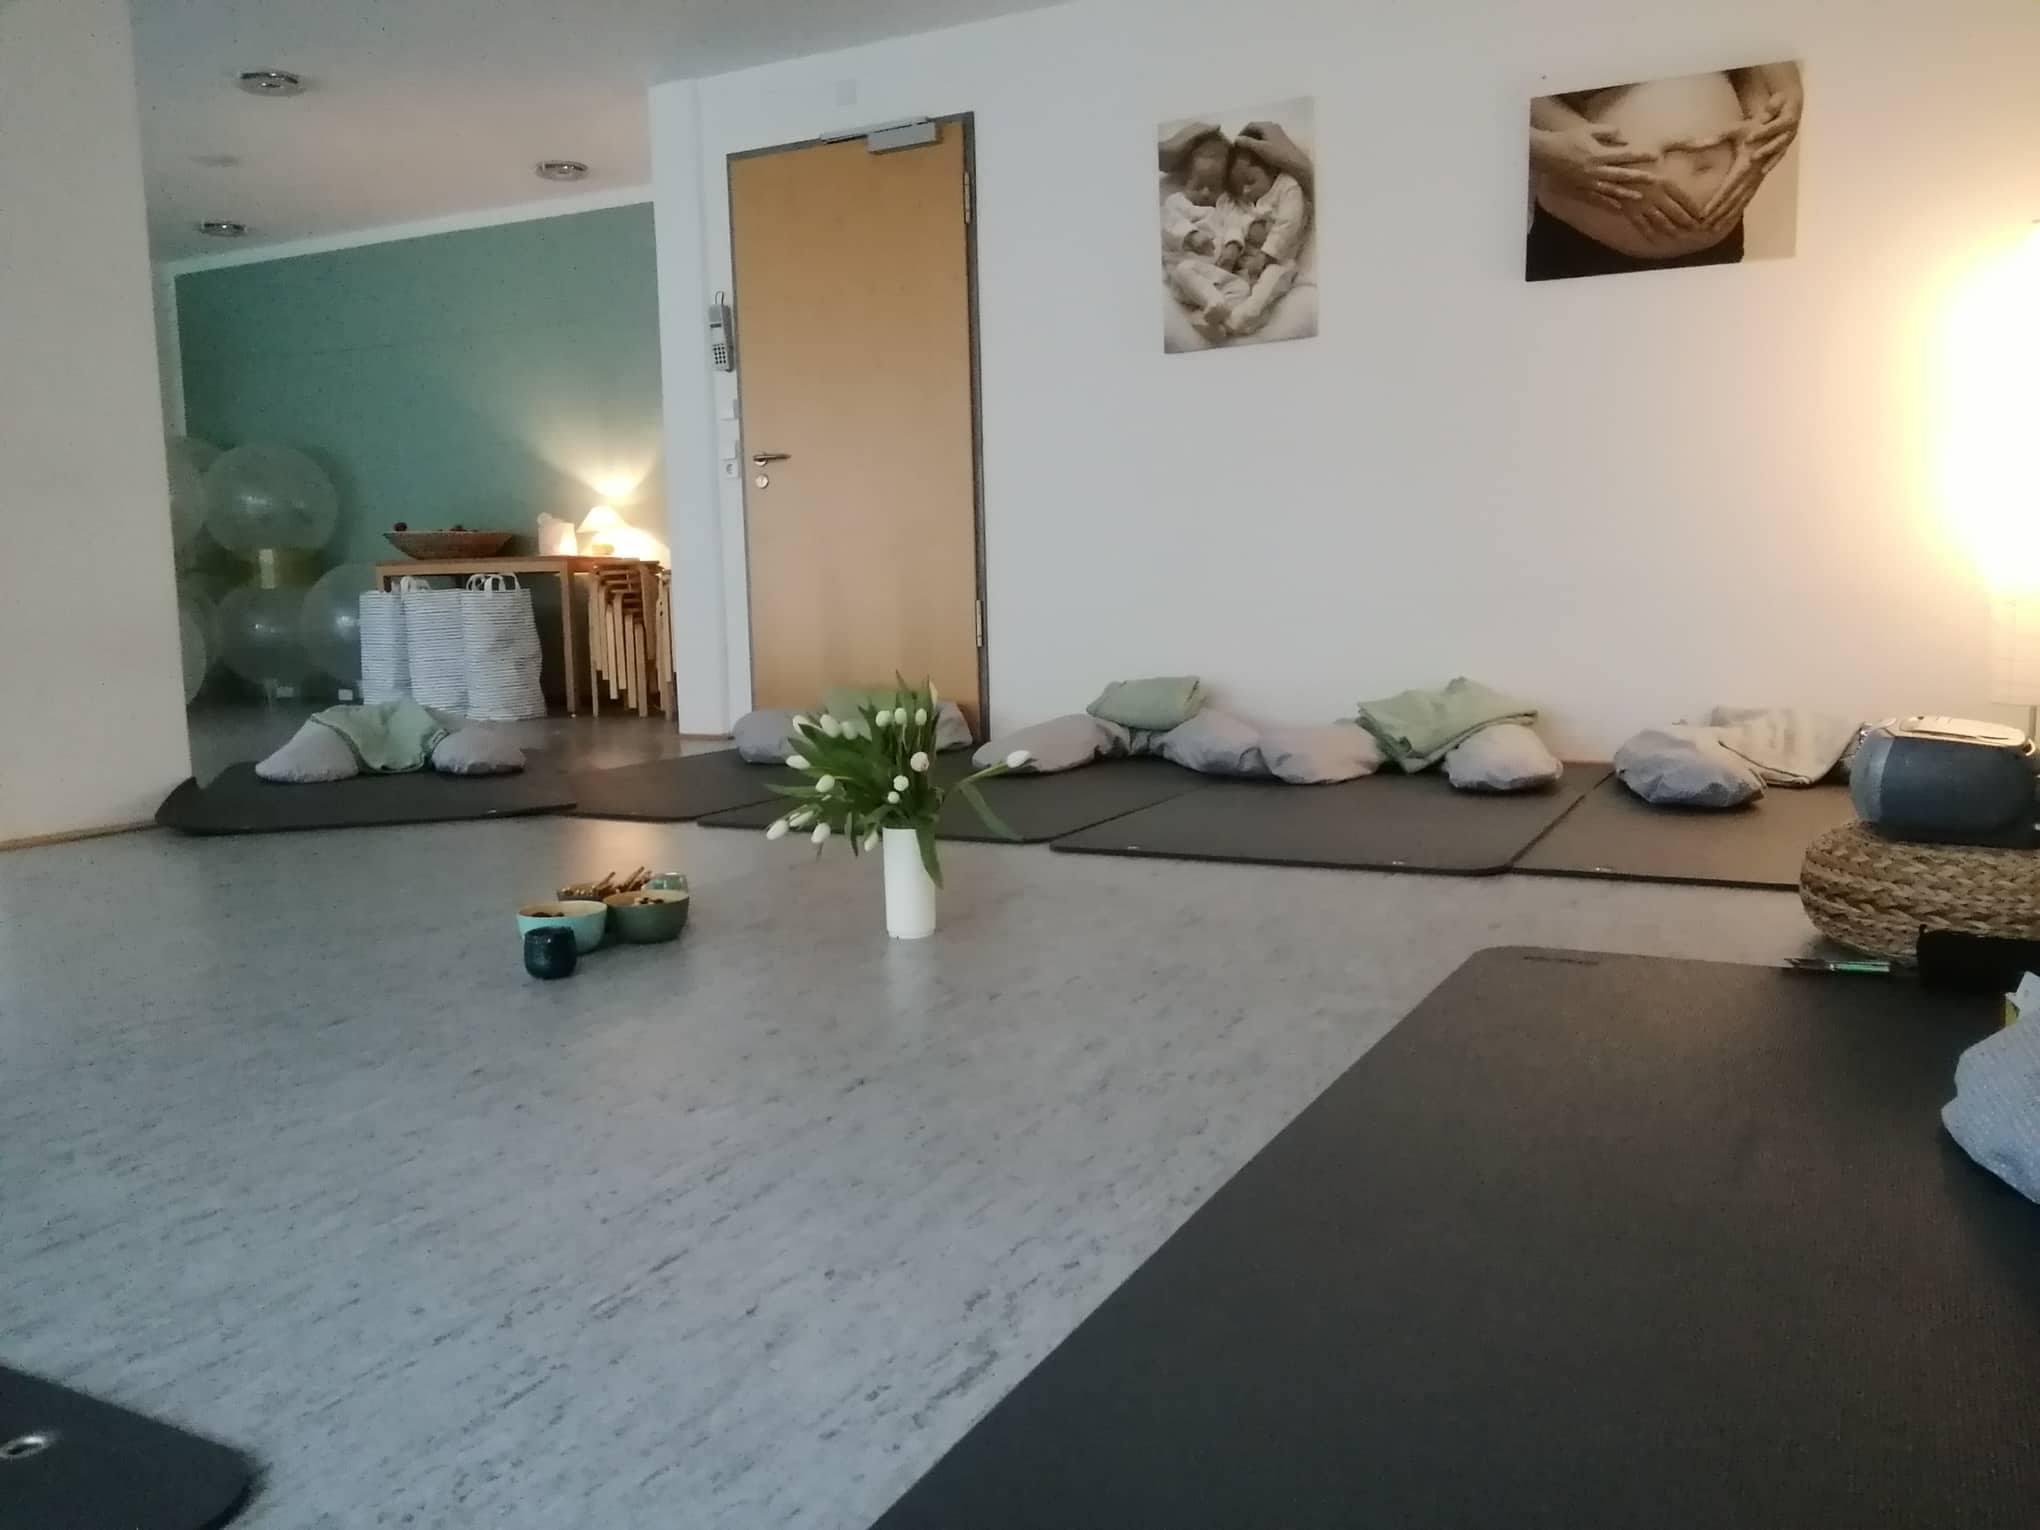 schwangerschaftsbegleitender geburtsvorbereitungskurs. Black Bedroom Furniture Sets. Home Design Ideas